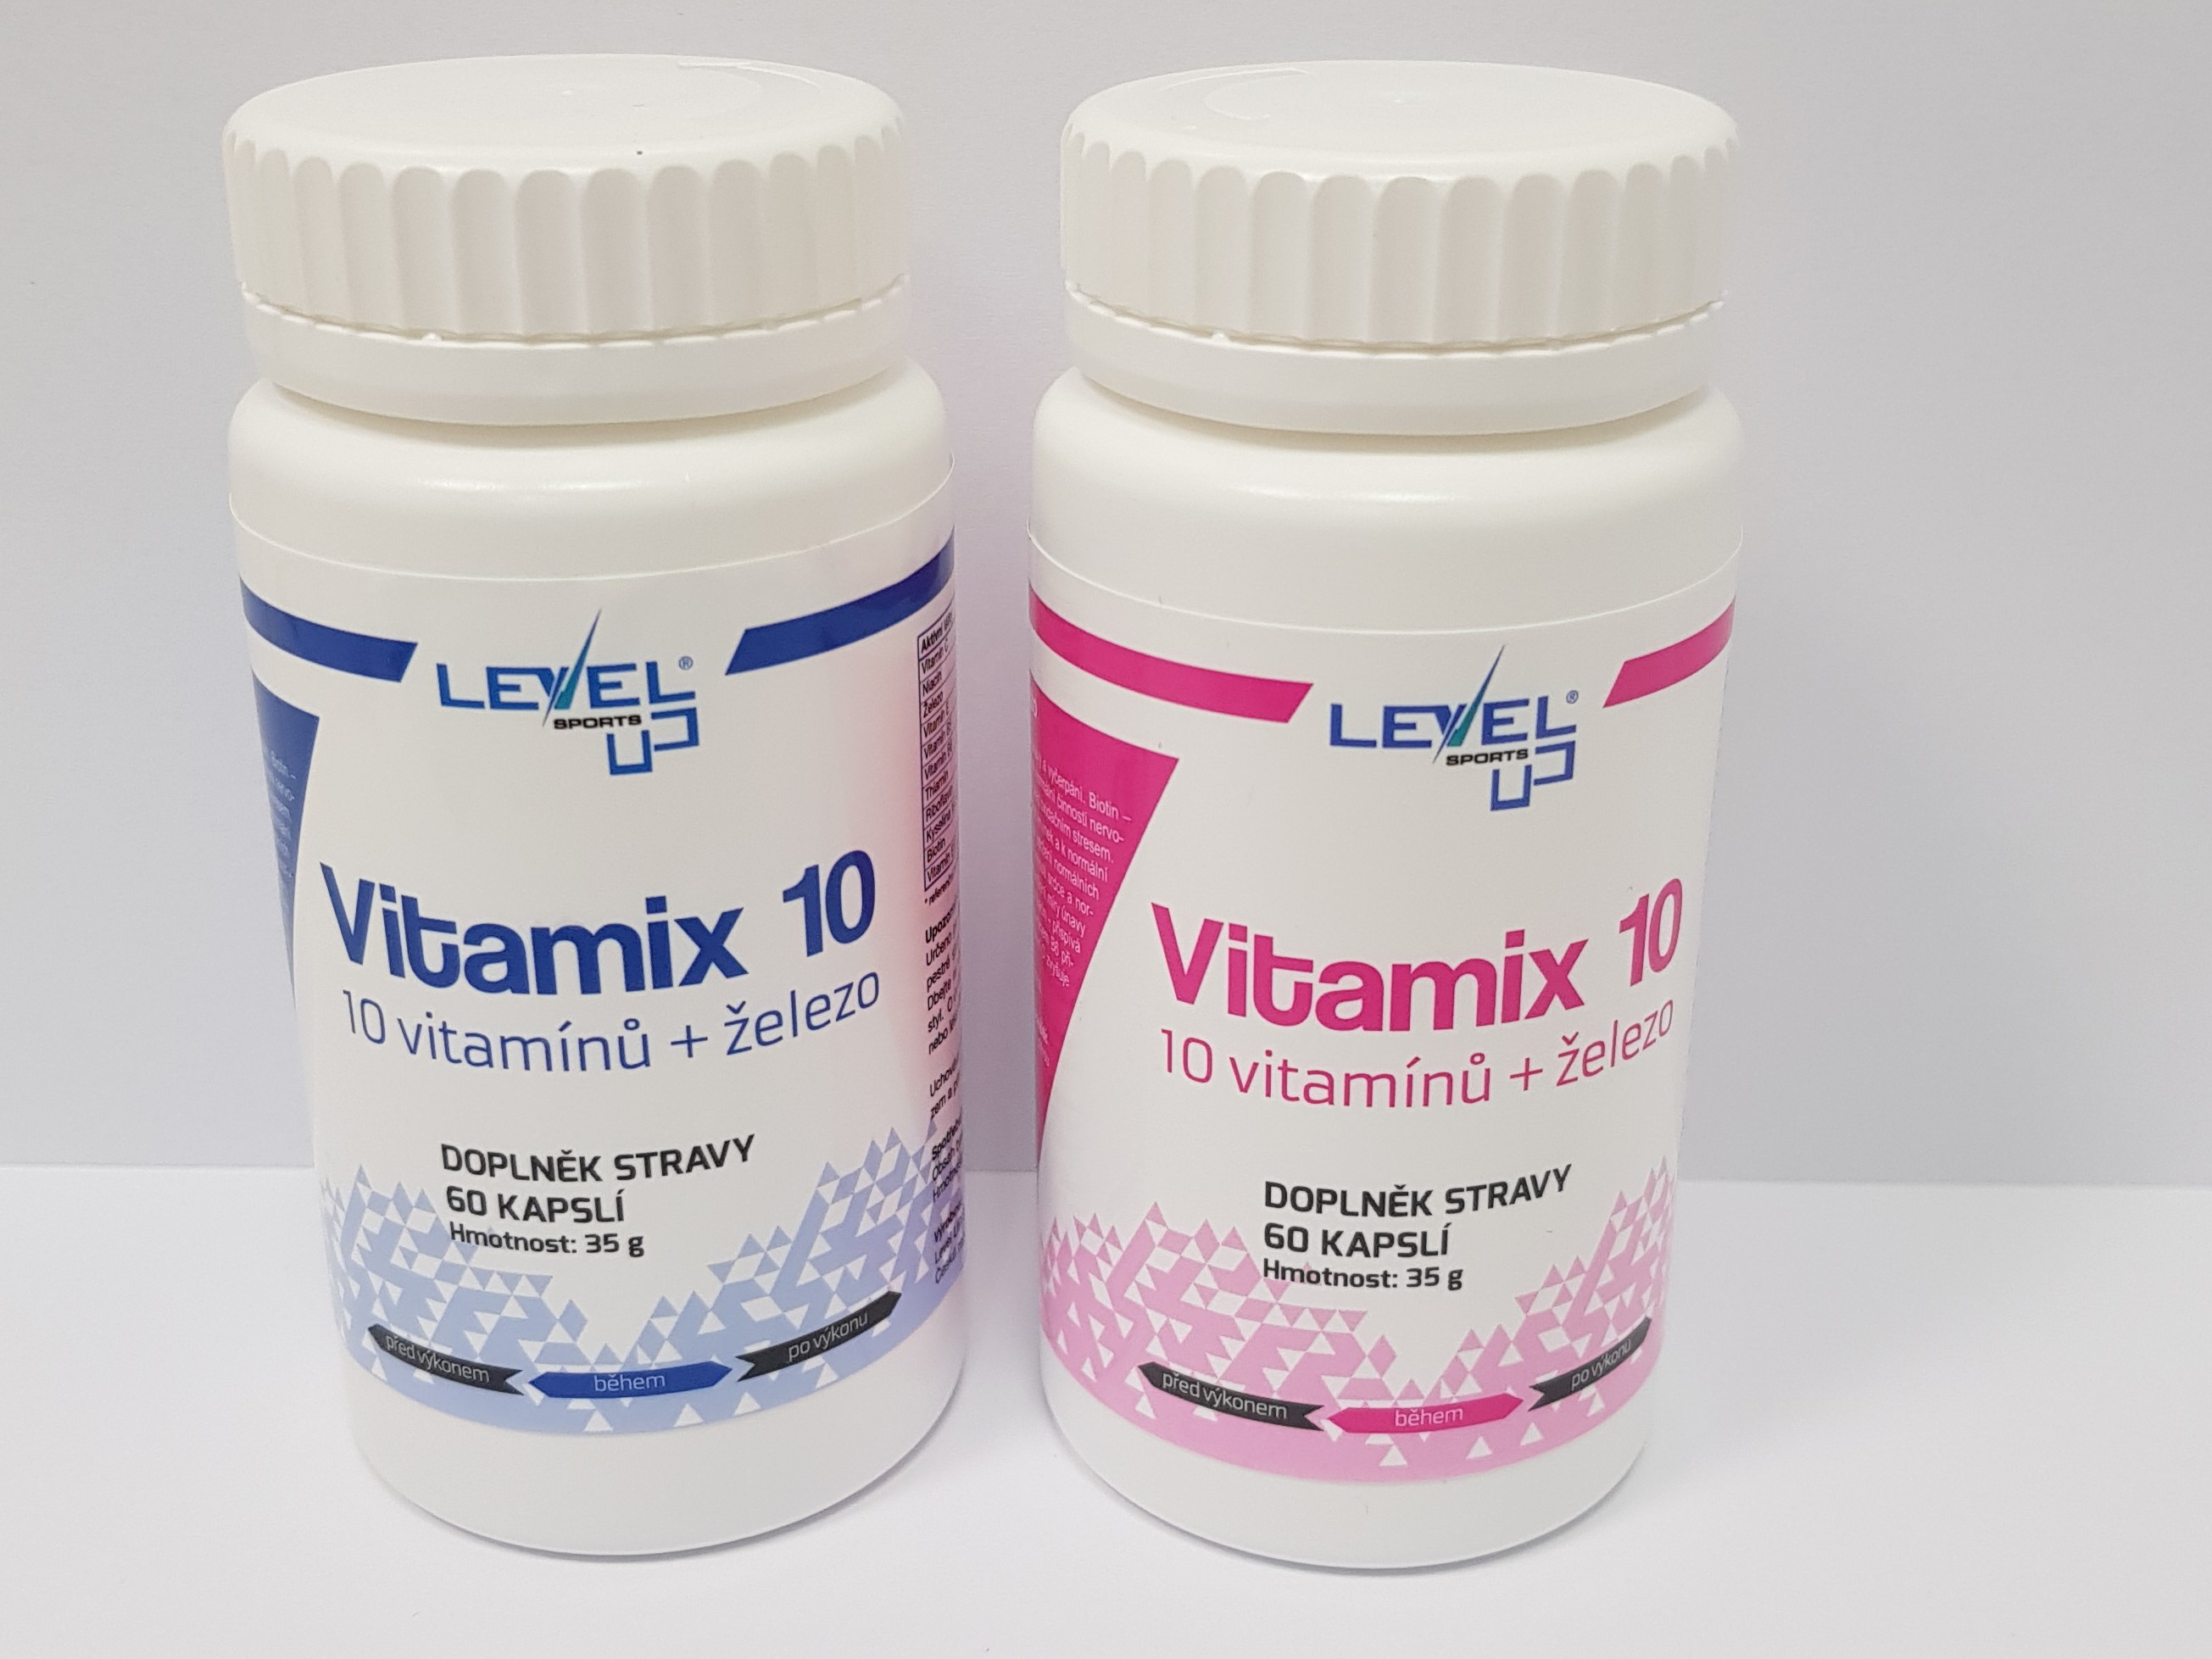 Vitamix 10